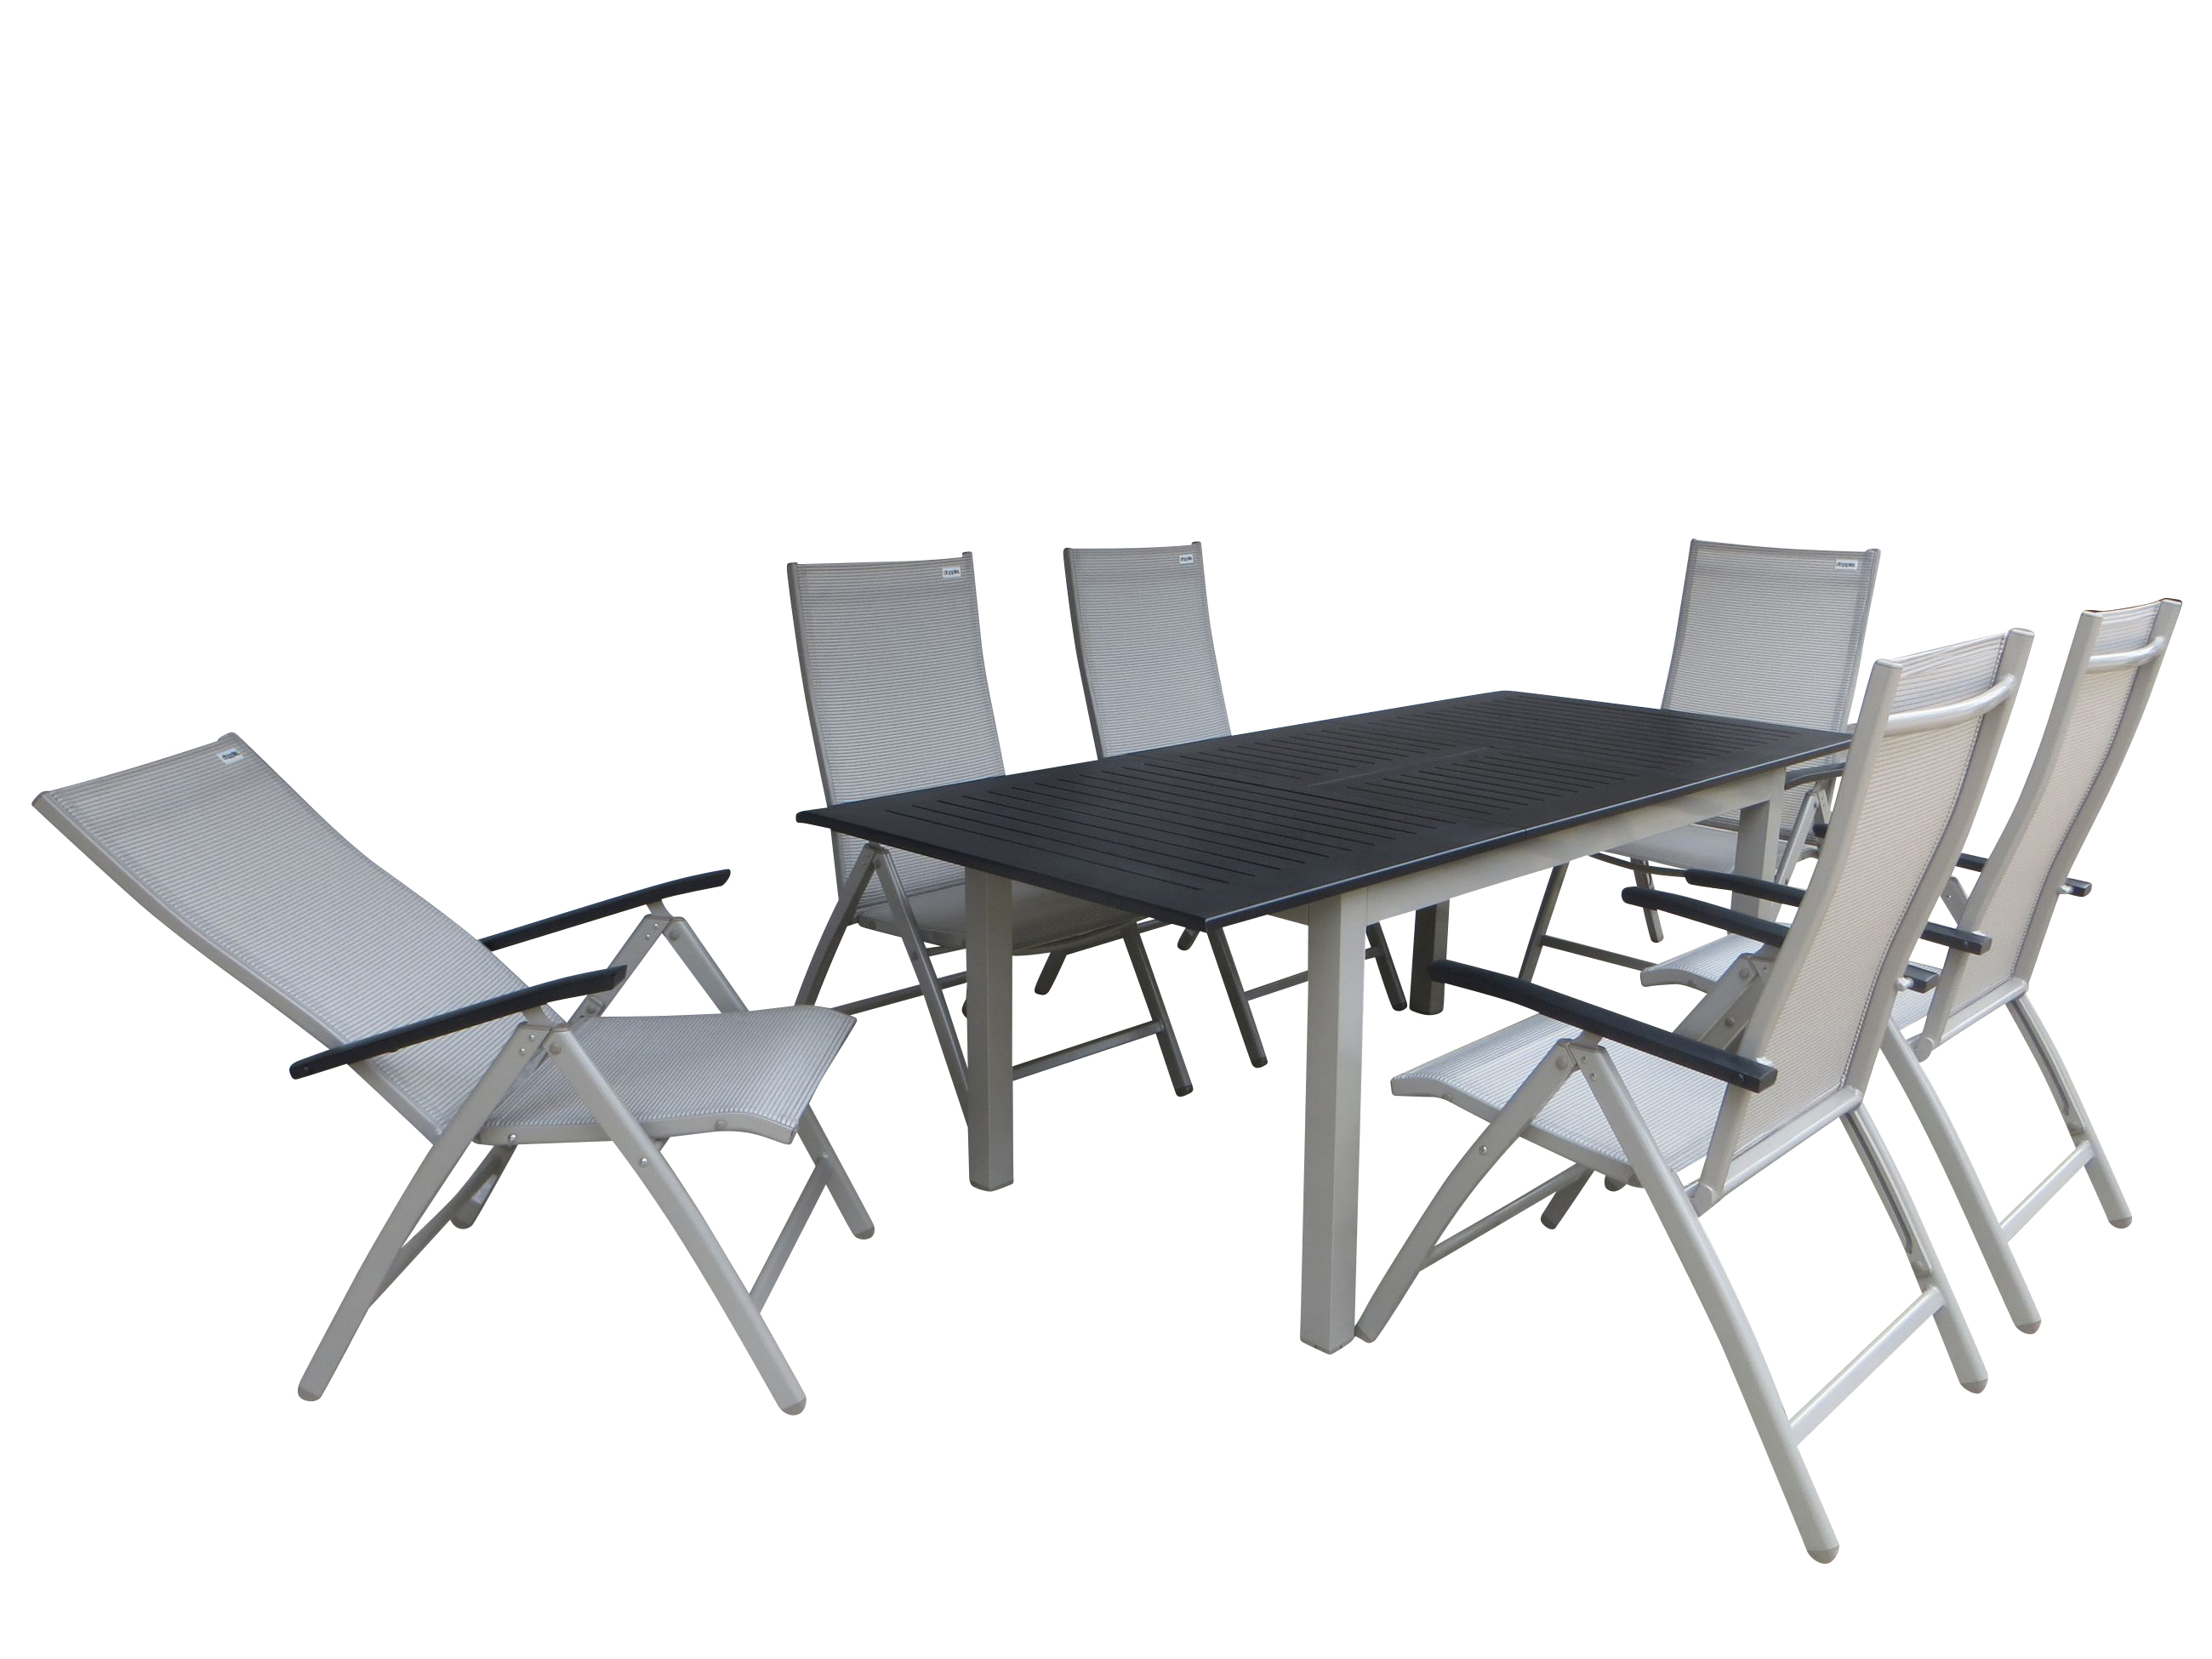 surat alu gartenm bel set sitzgarnitur 7 teilig champagner gartenm bel gruppen garten. Black Bedroom Furniture Sets. Home Design Ideas